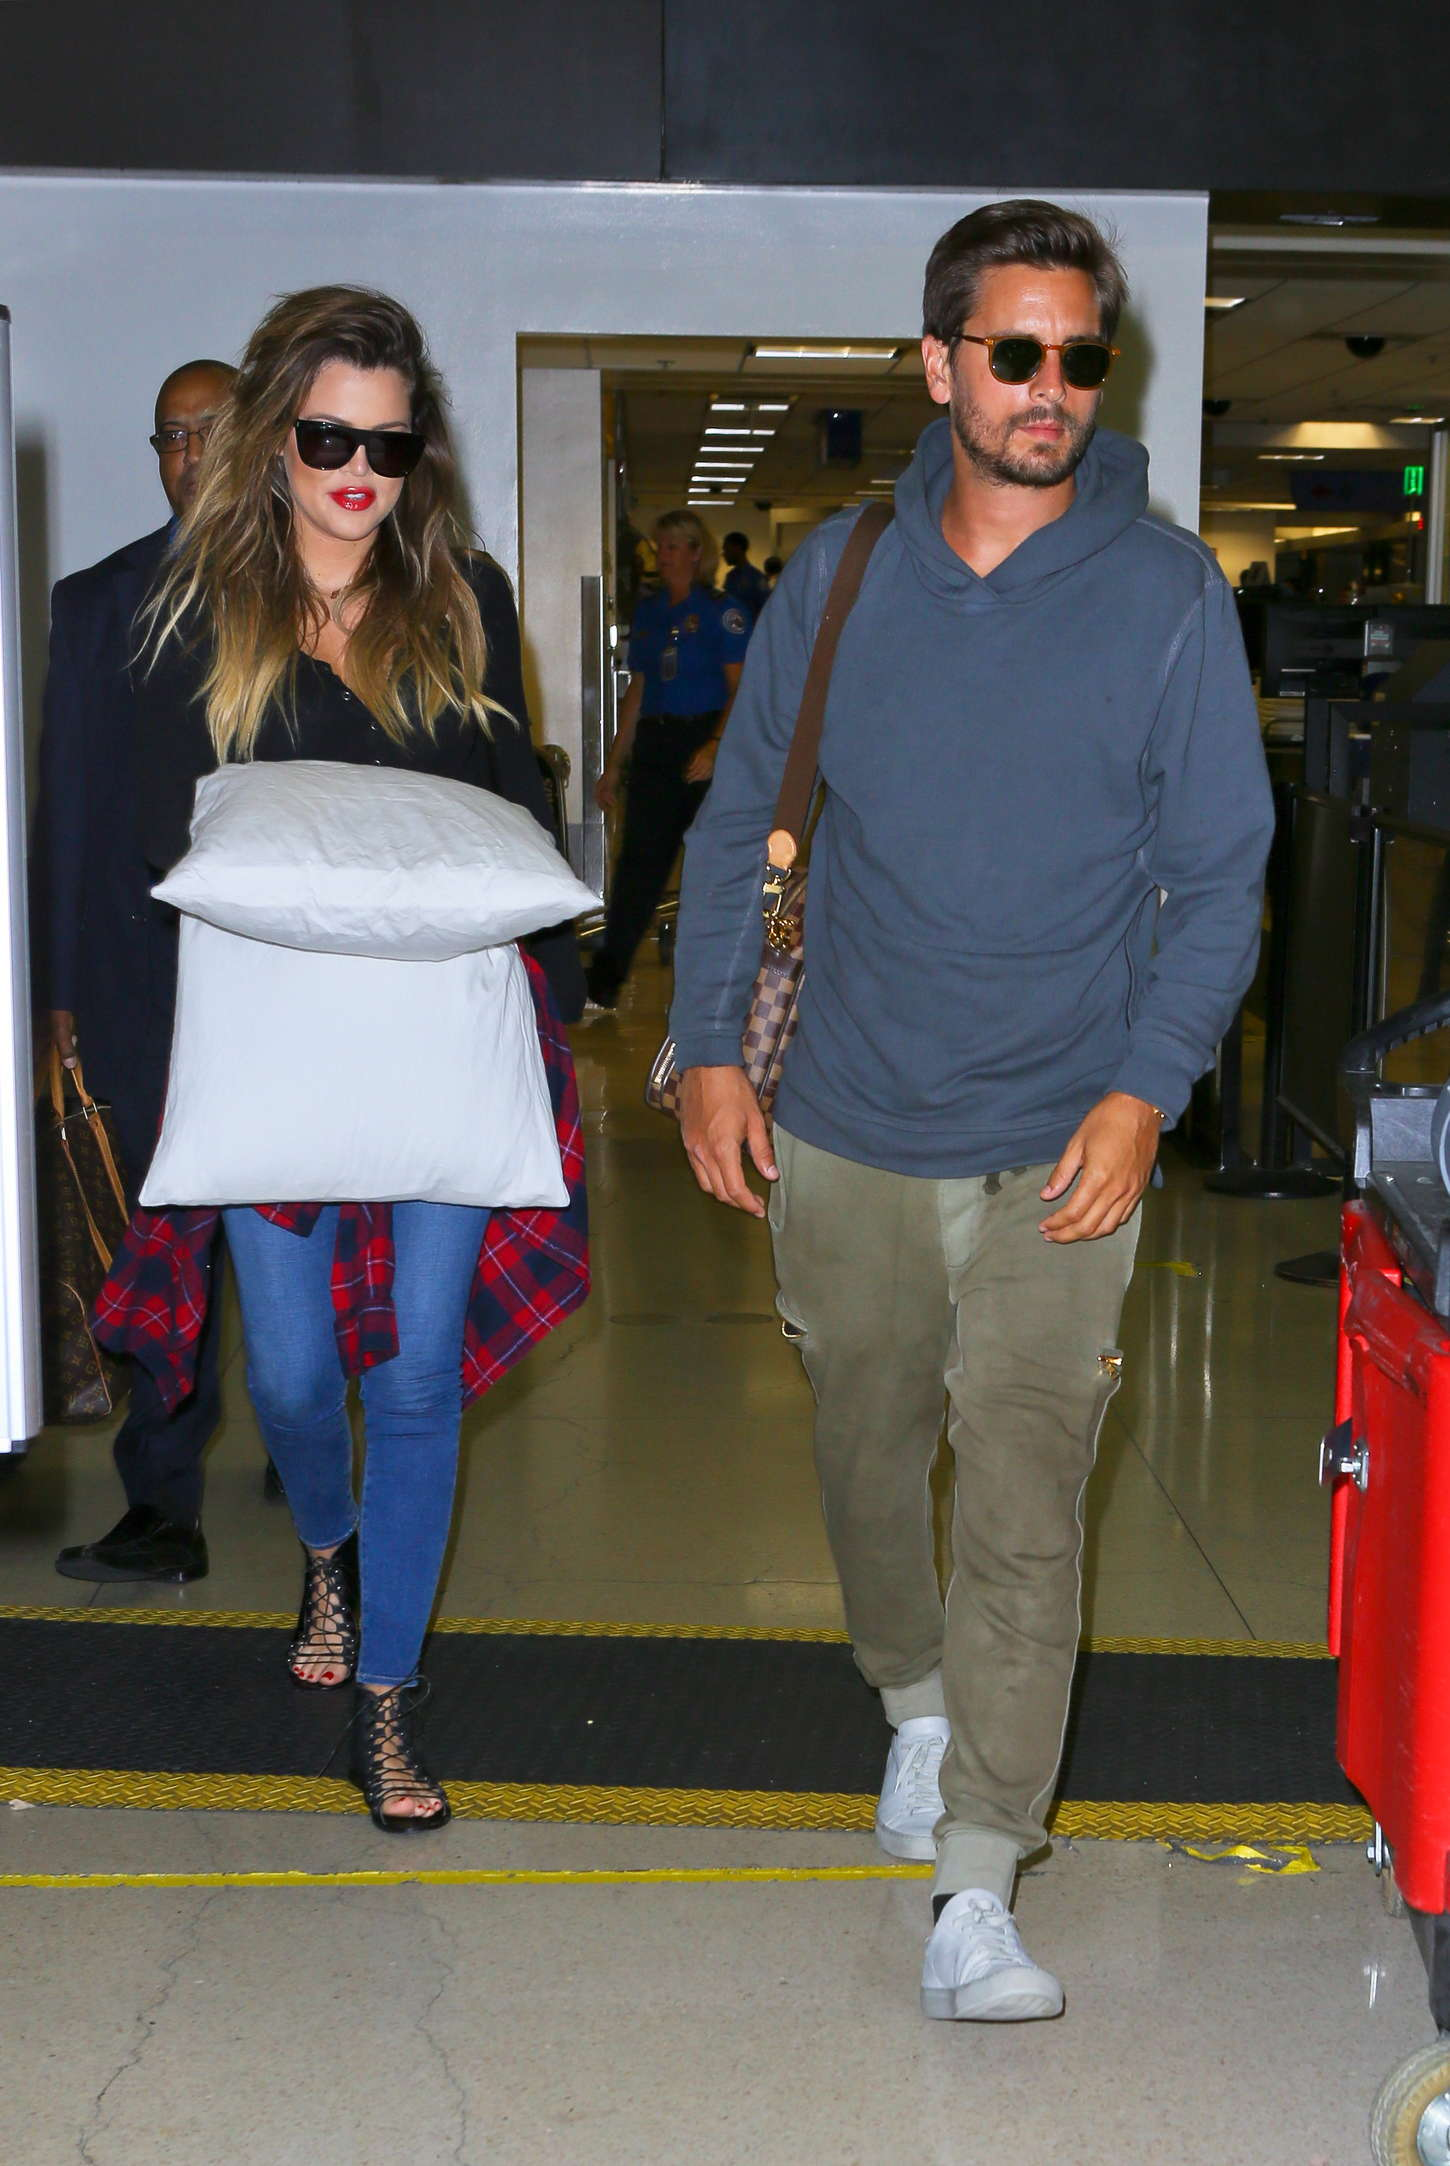 Khloe Kardashian 2014 : Khloe Kardashian with Scott Disick at LAX airport -13